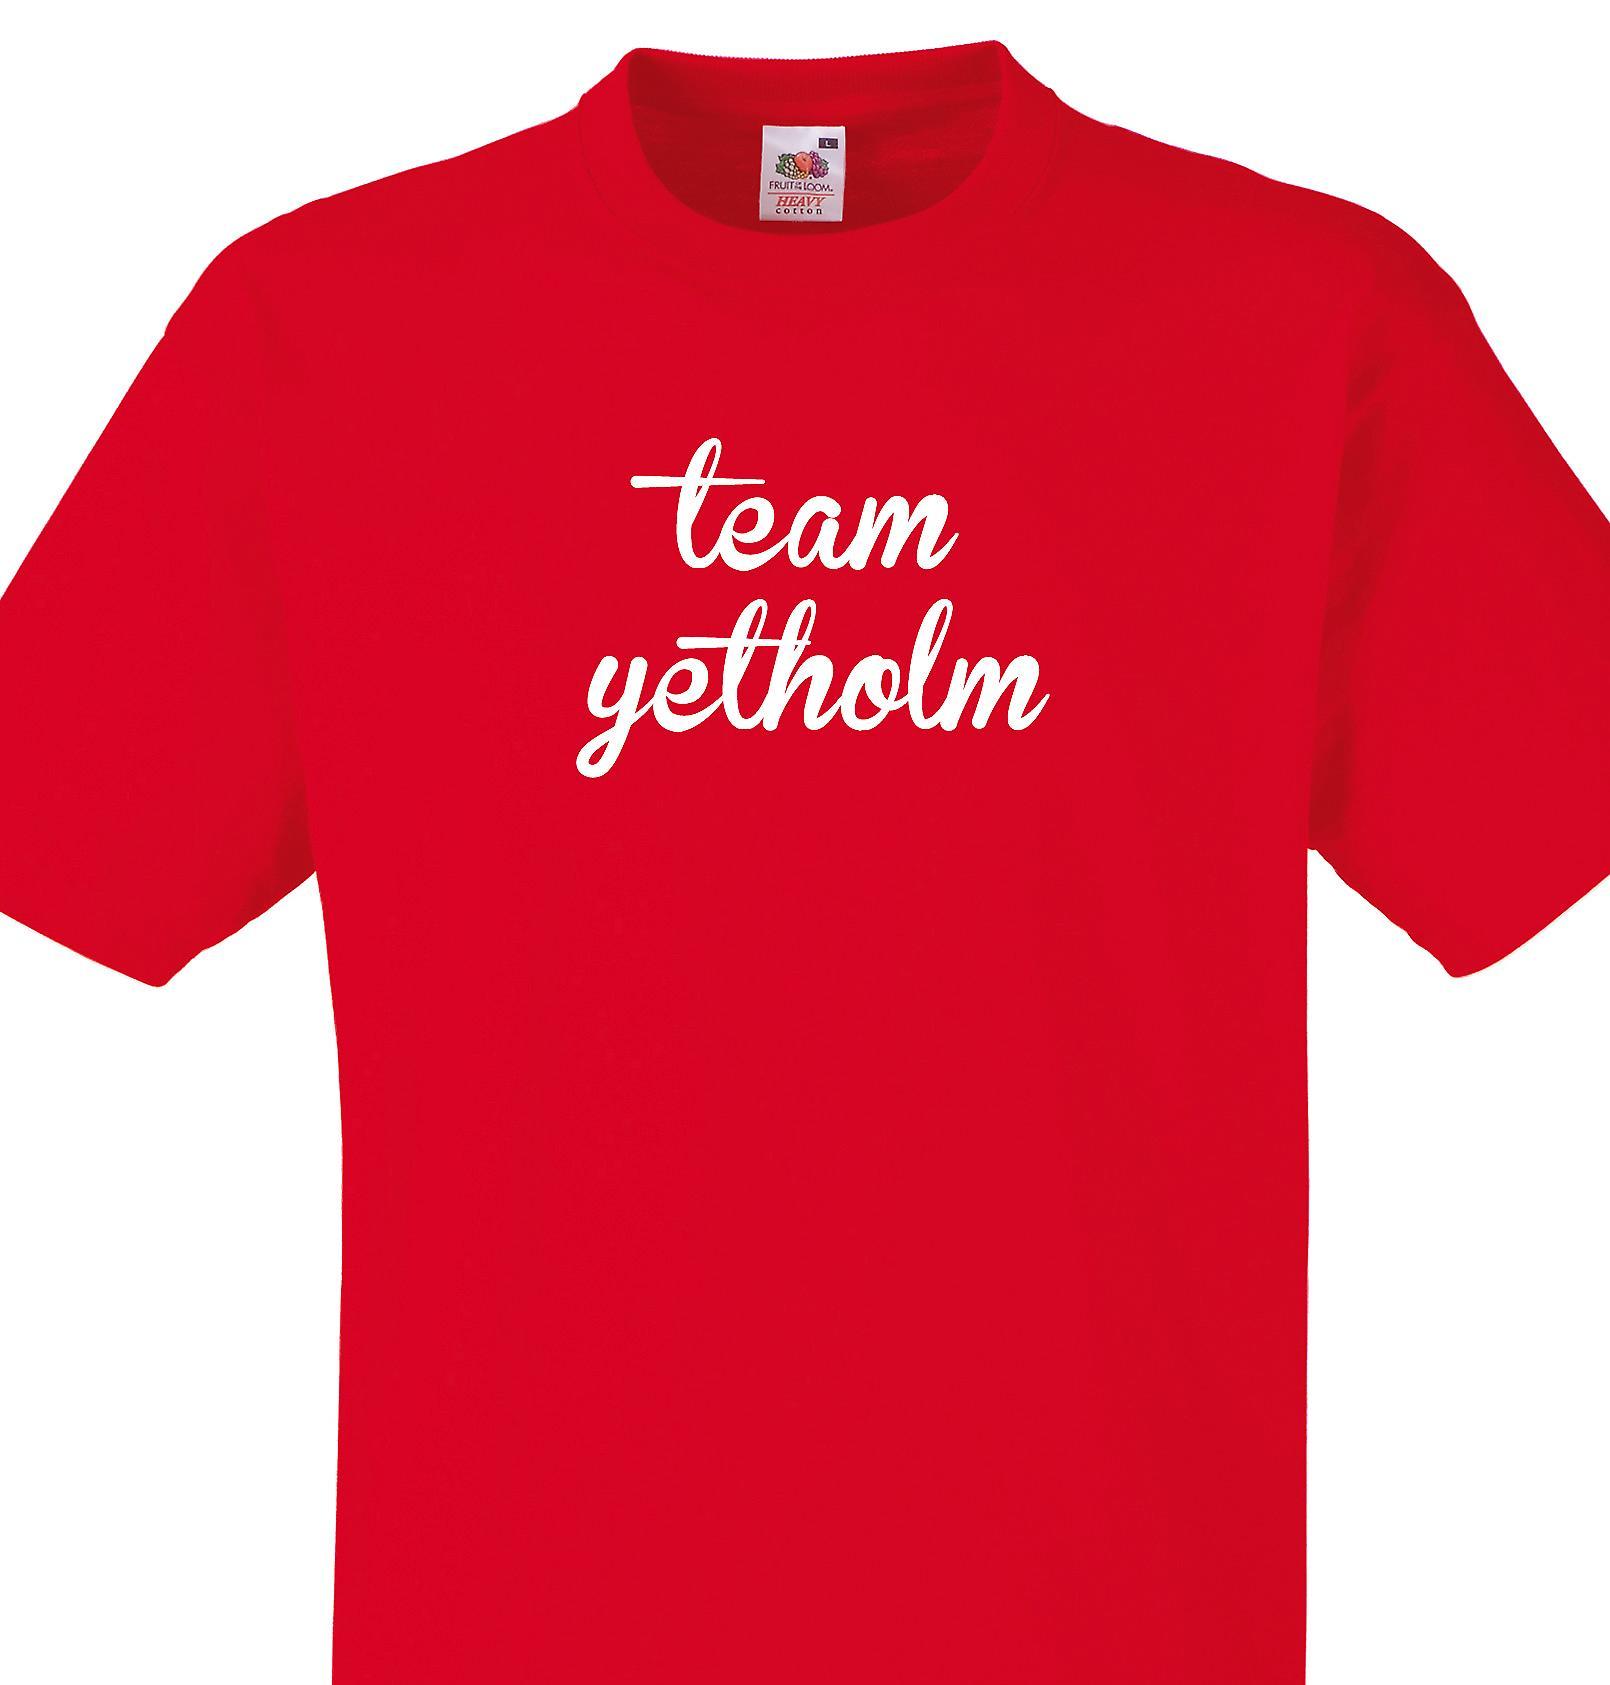 Team Yetholm Red T shirt